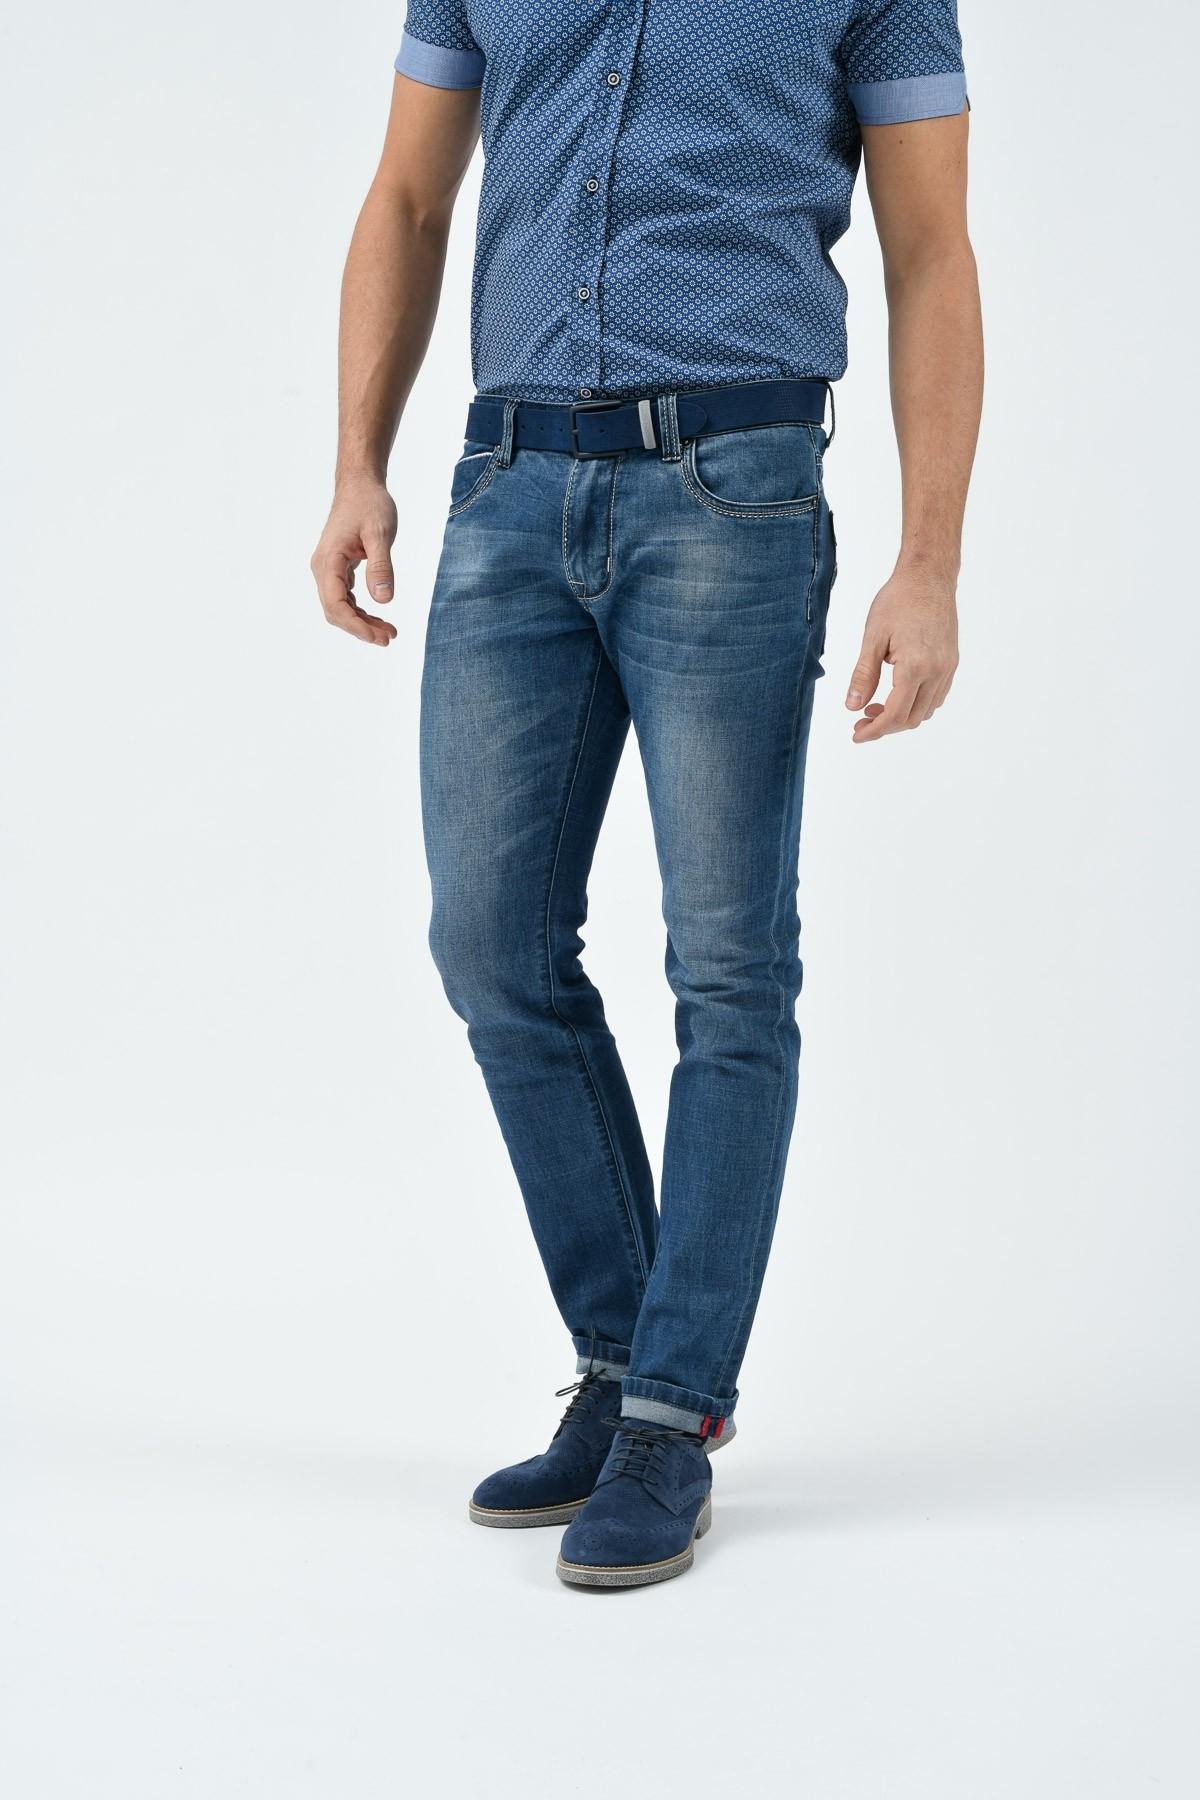 Pantaloni Barbati InvidiaUomo J5T 118